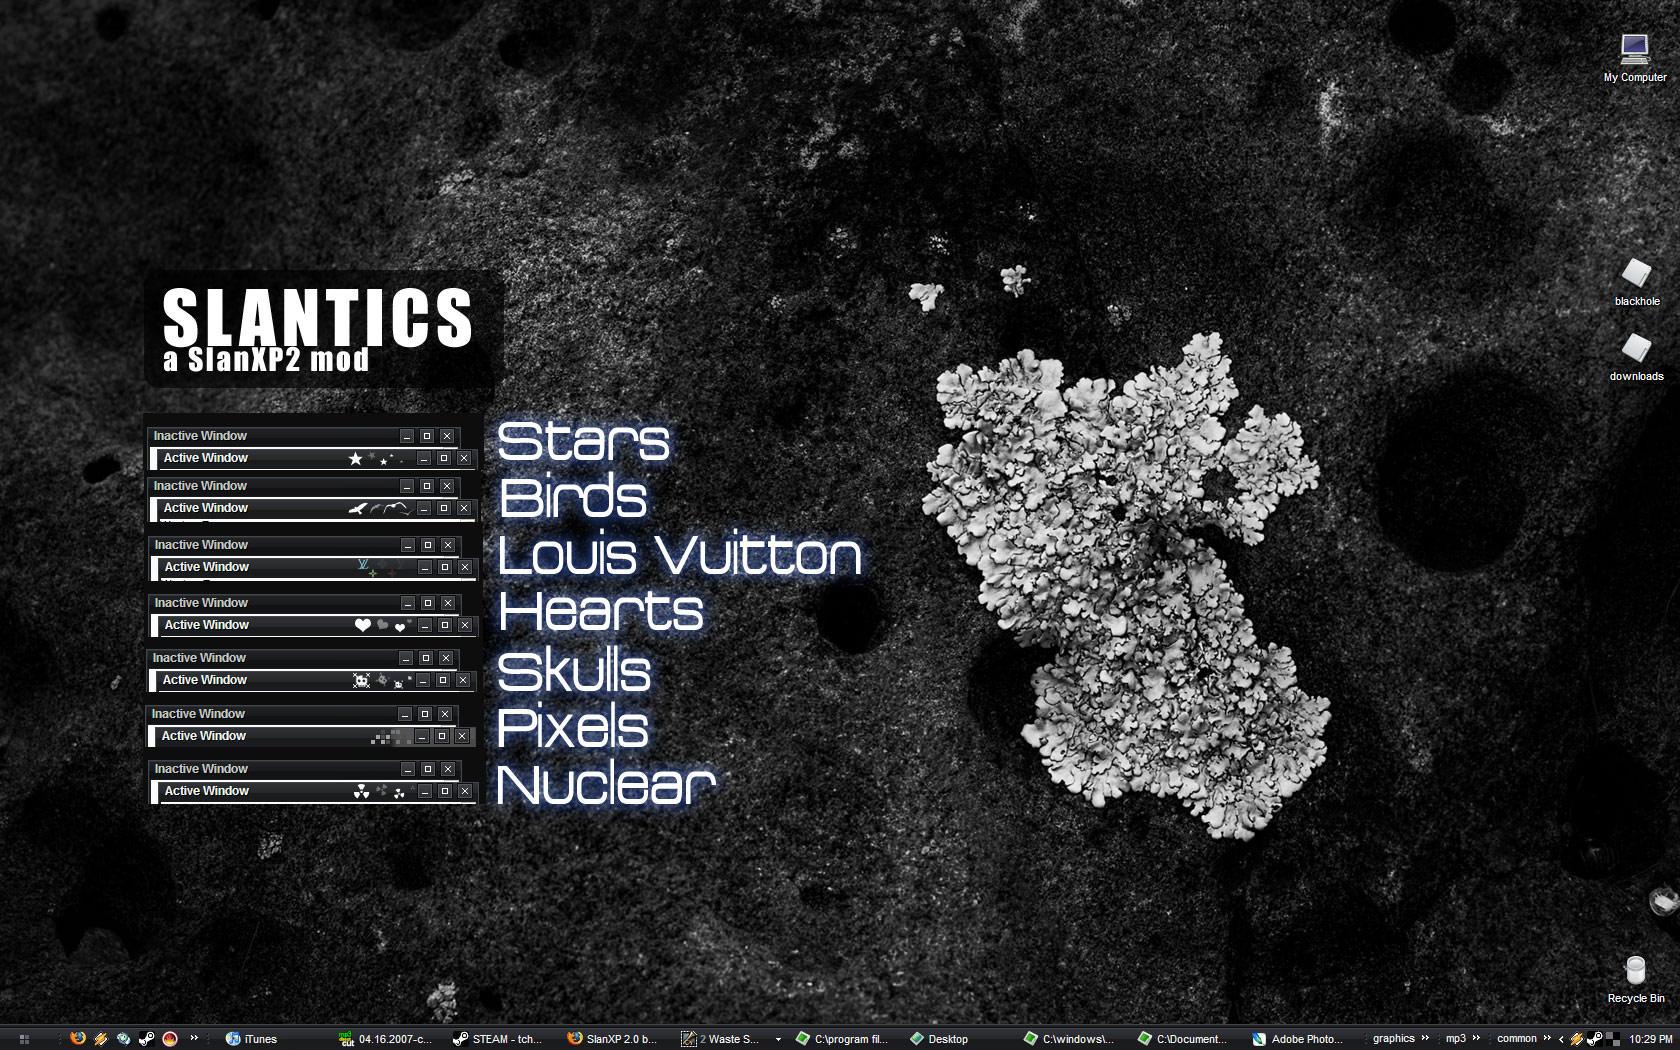 Slantics VS by tch